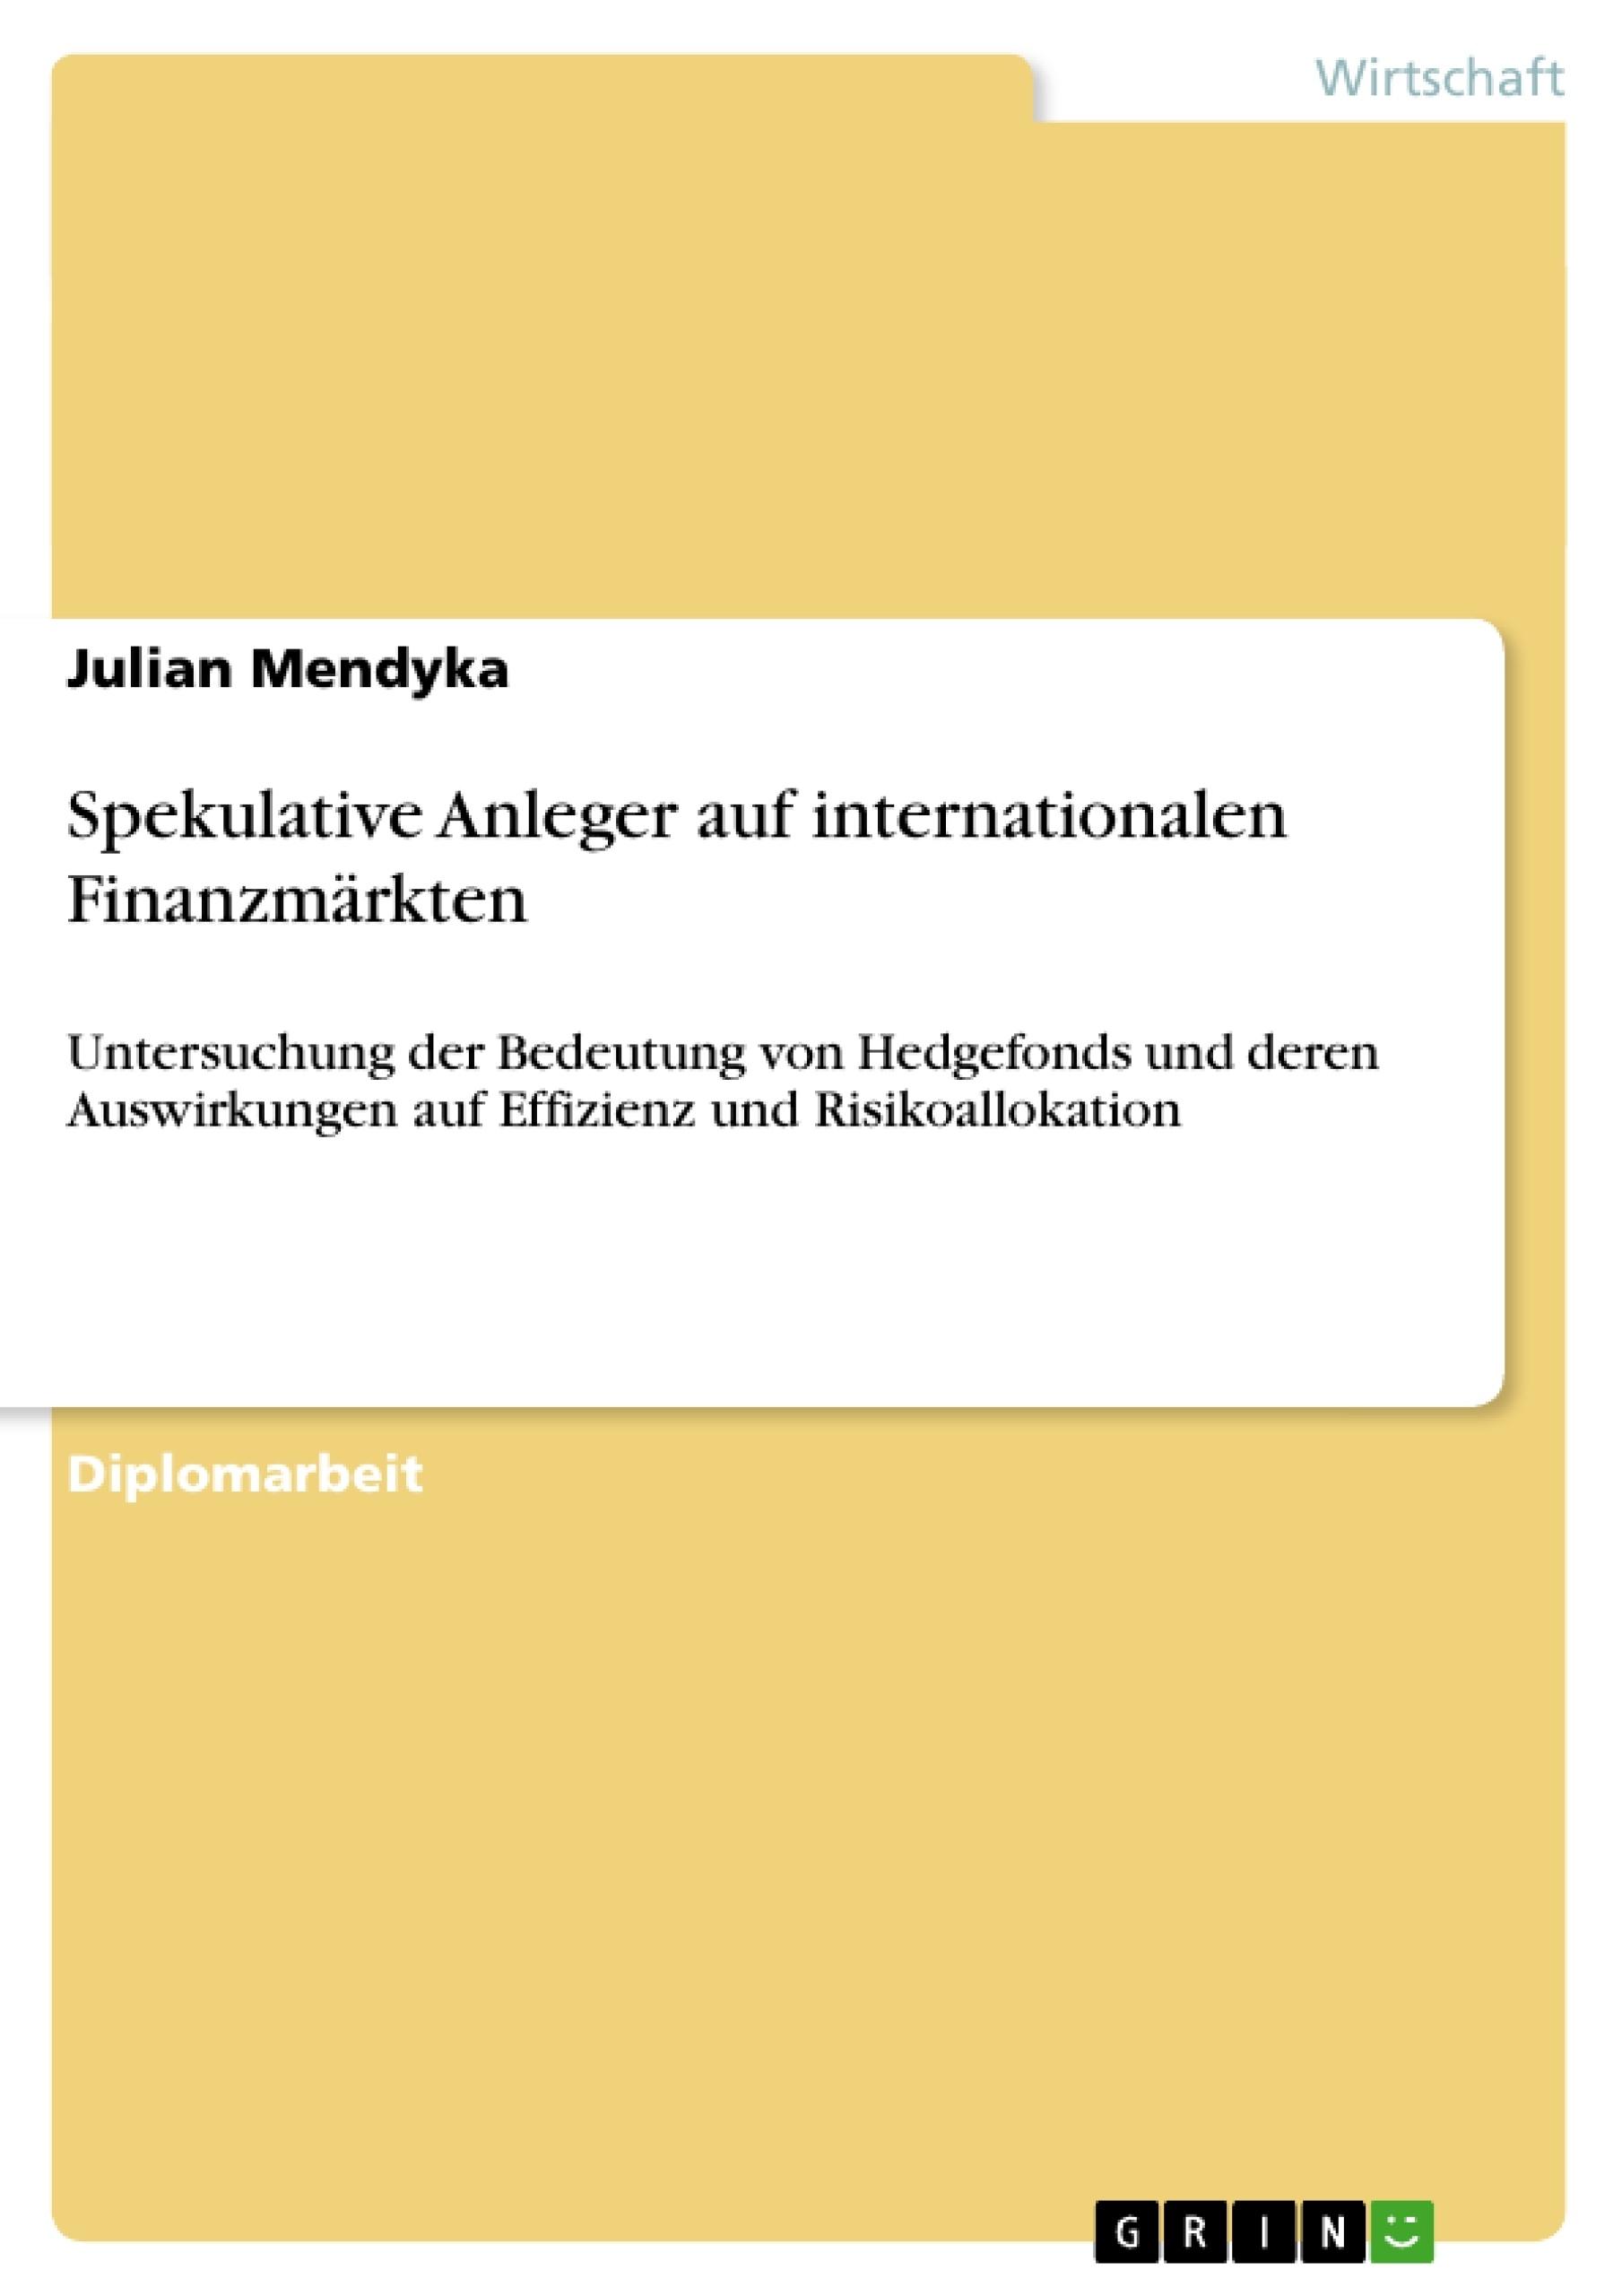 Titel: Spekulative Anleger auf internationalen Finanzmärkten